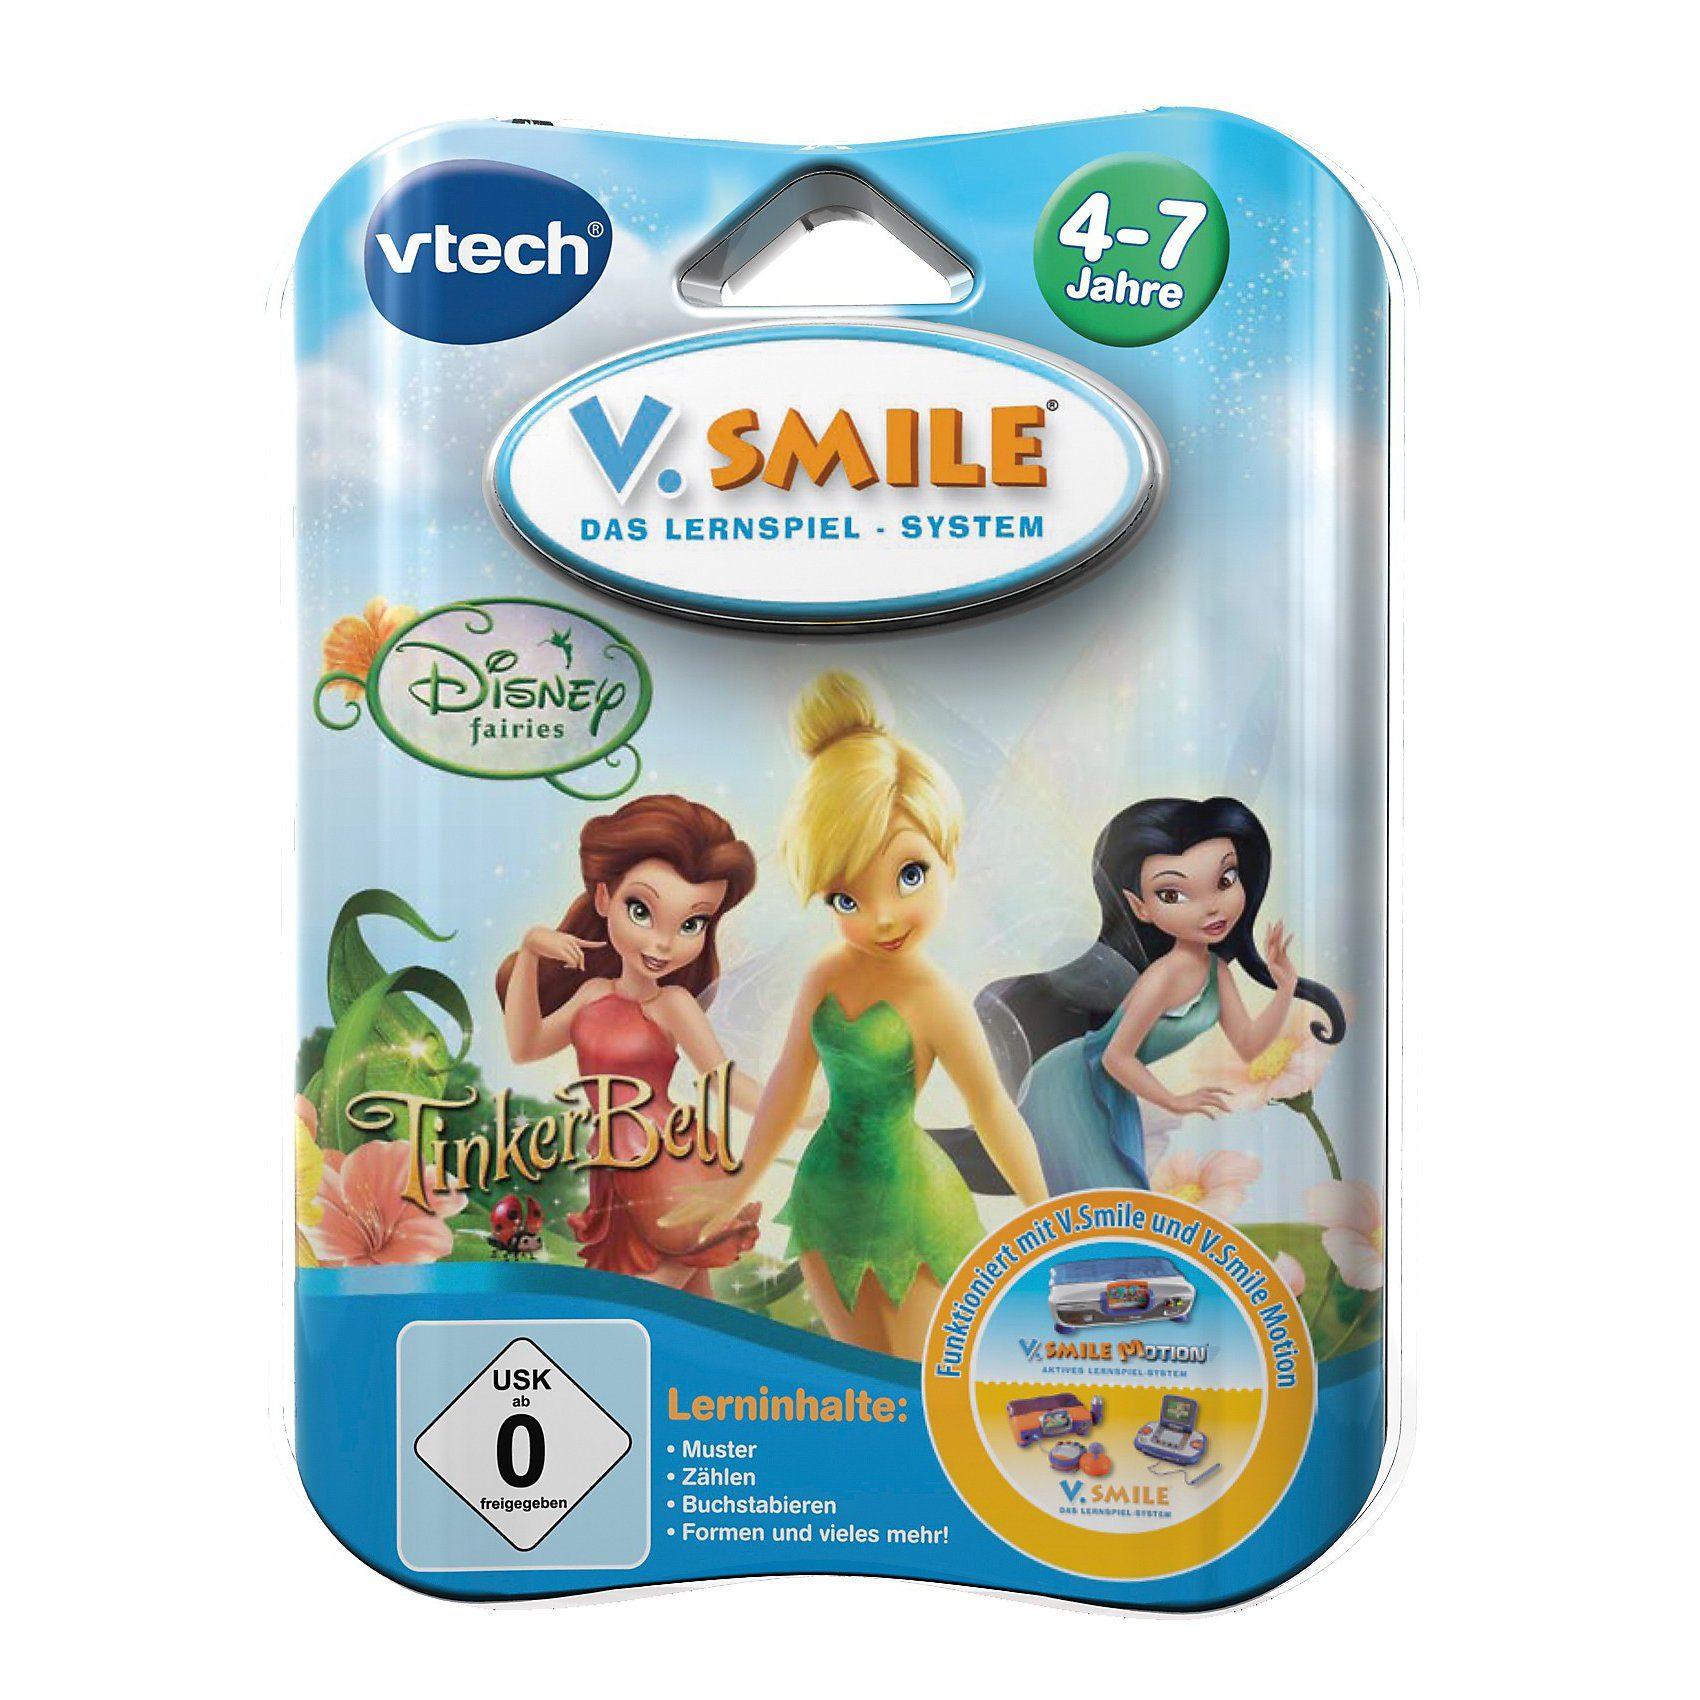 "Vtech V.Smile Lernspiel ""Tinkerbell"""